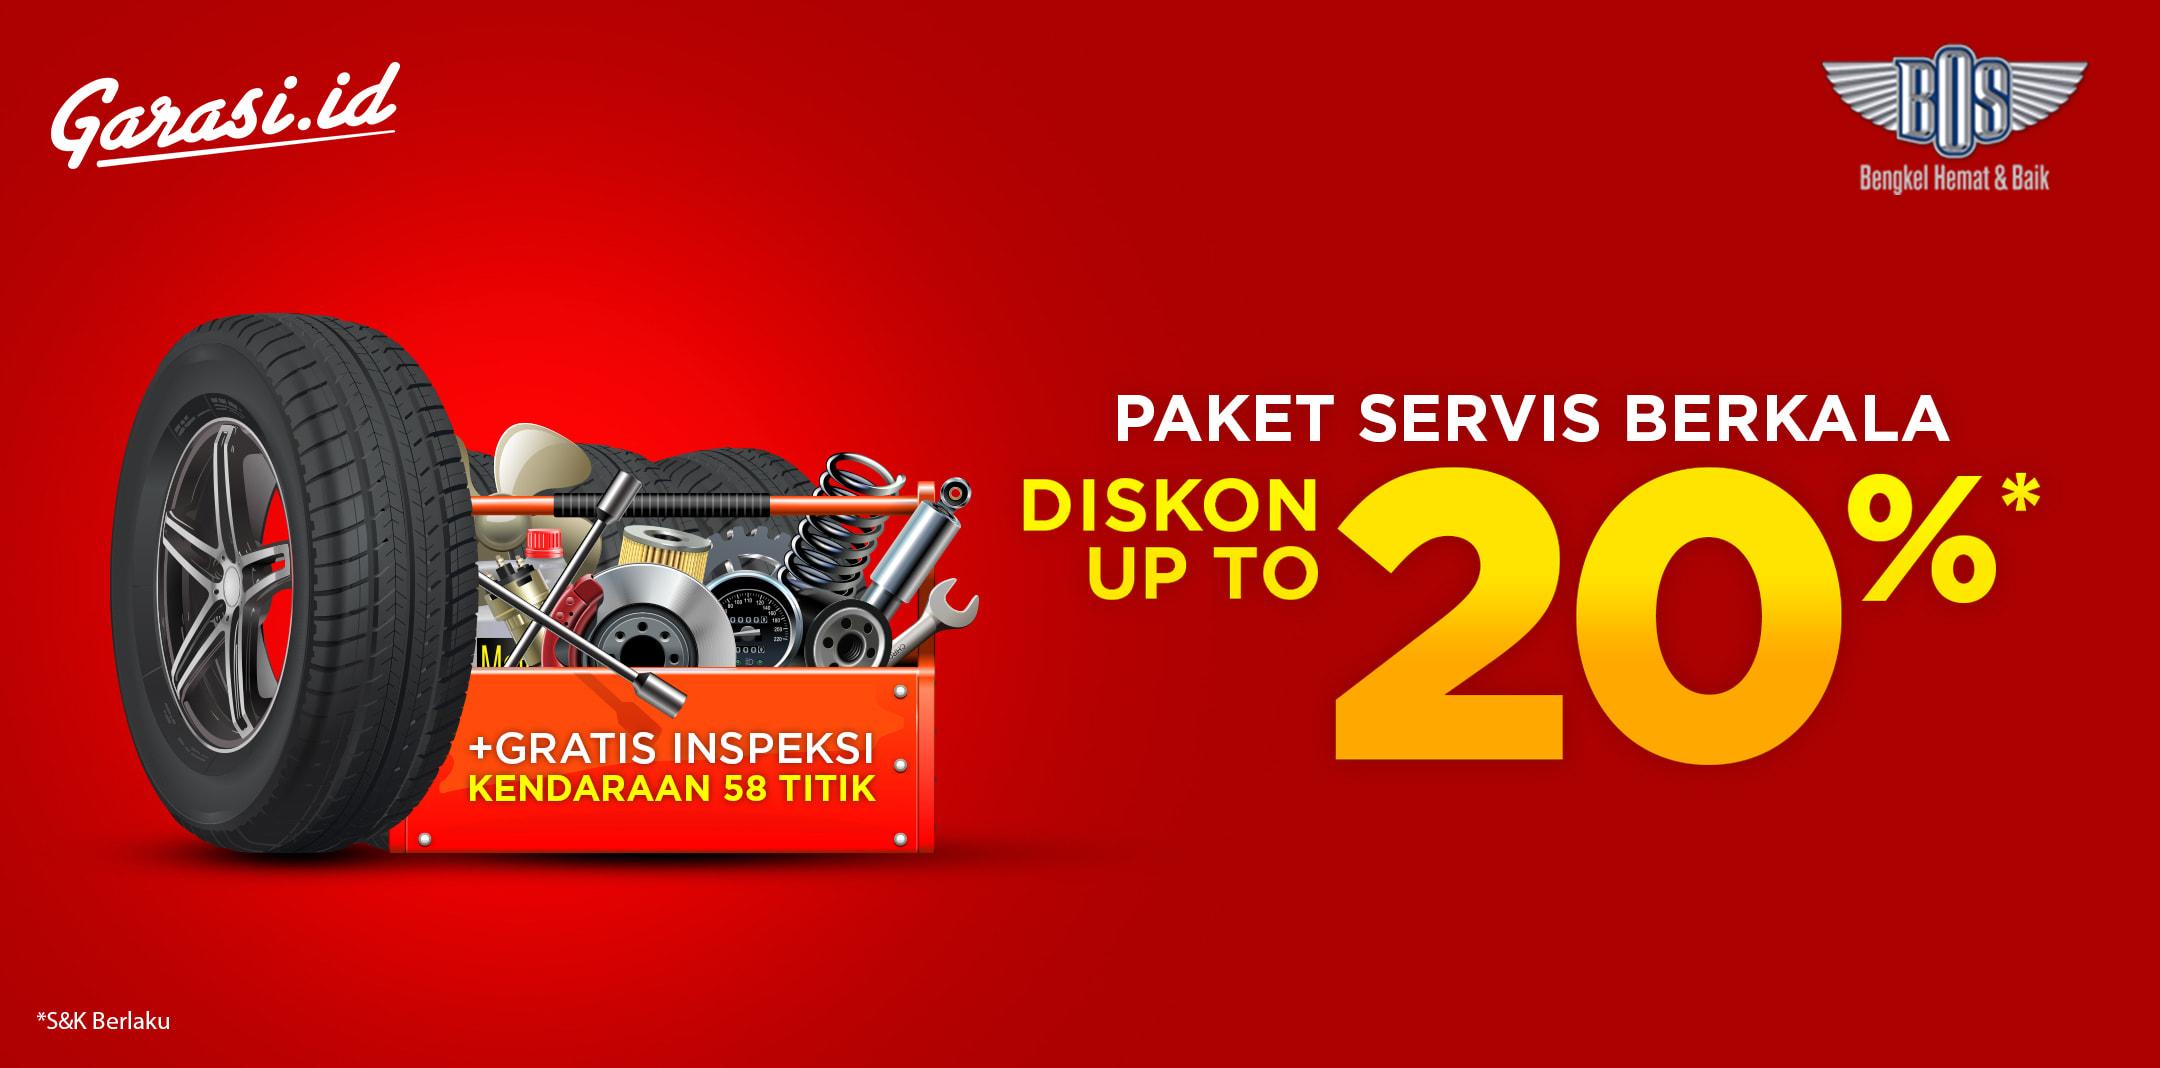 Servis mudah dan cepat di Bengkel Bos, Diskon 20% untuk semua produk Servis Berkala